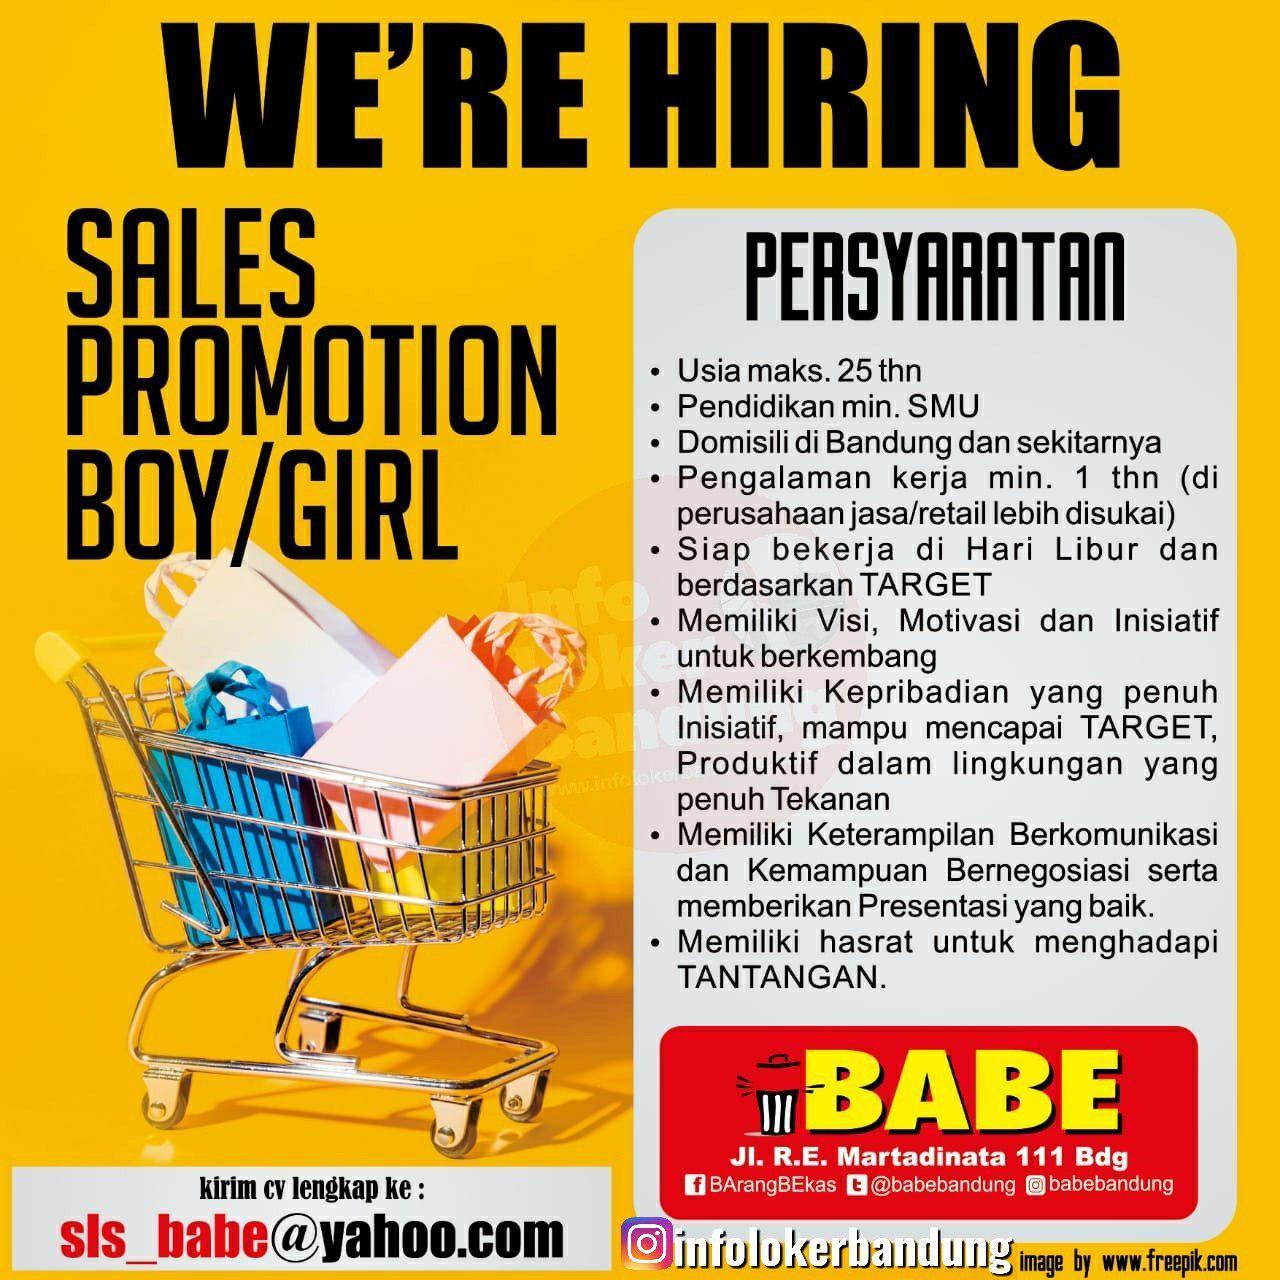 Lowongan Kerja SPB & SPB Babe ( Barang Bekas) Bandung Mei 2019